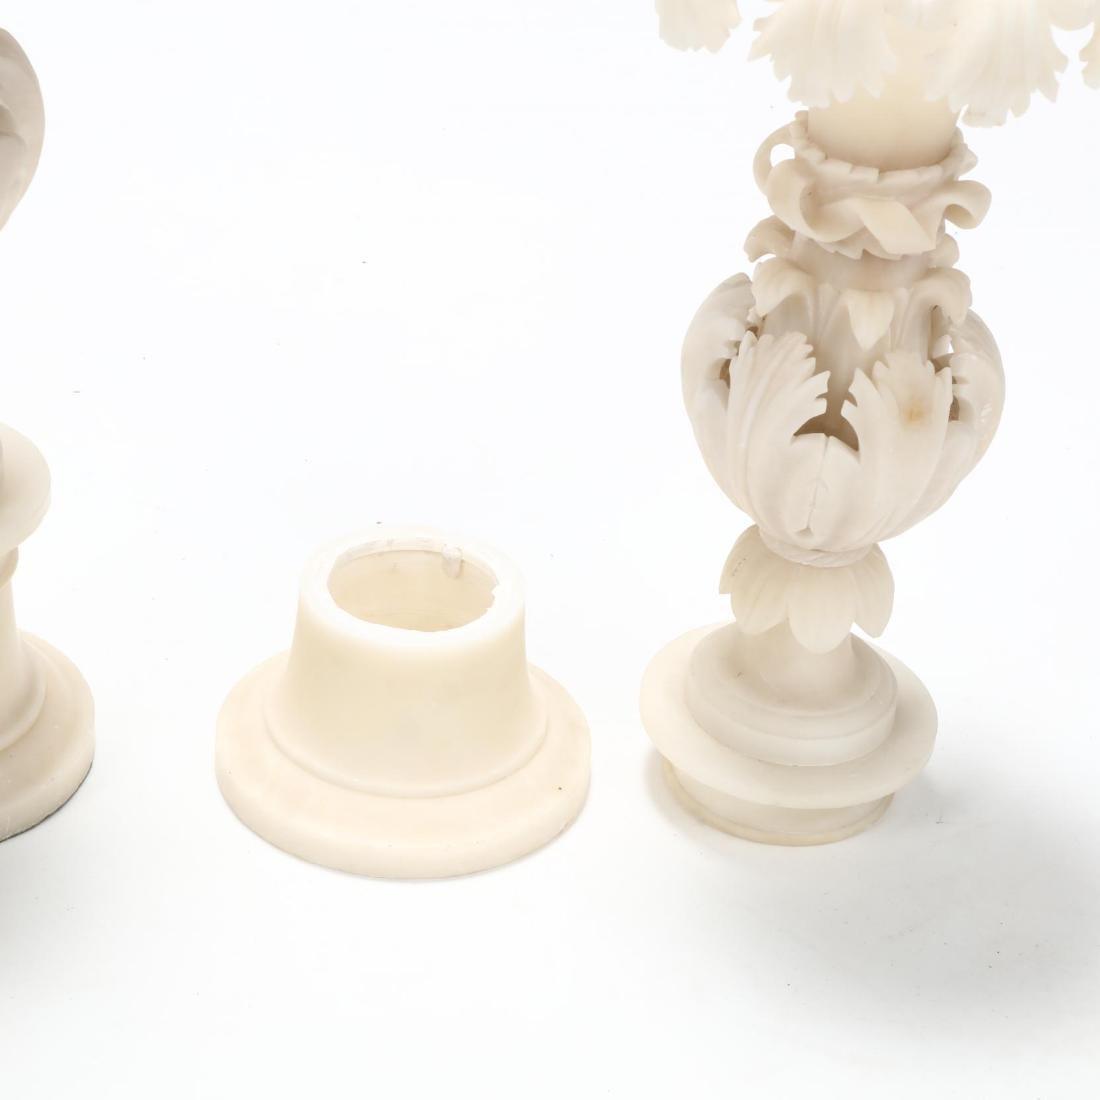 Pair of Carved Alabaster Garnitures - 2